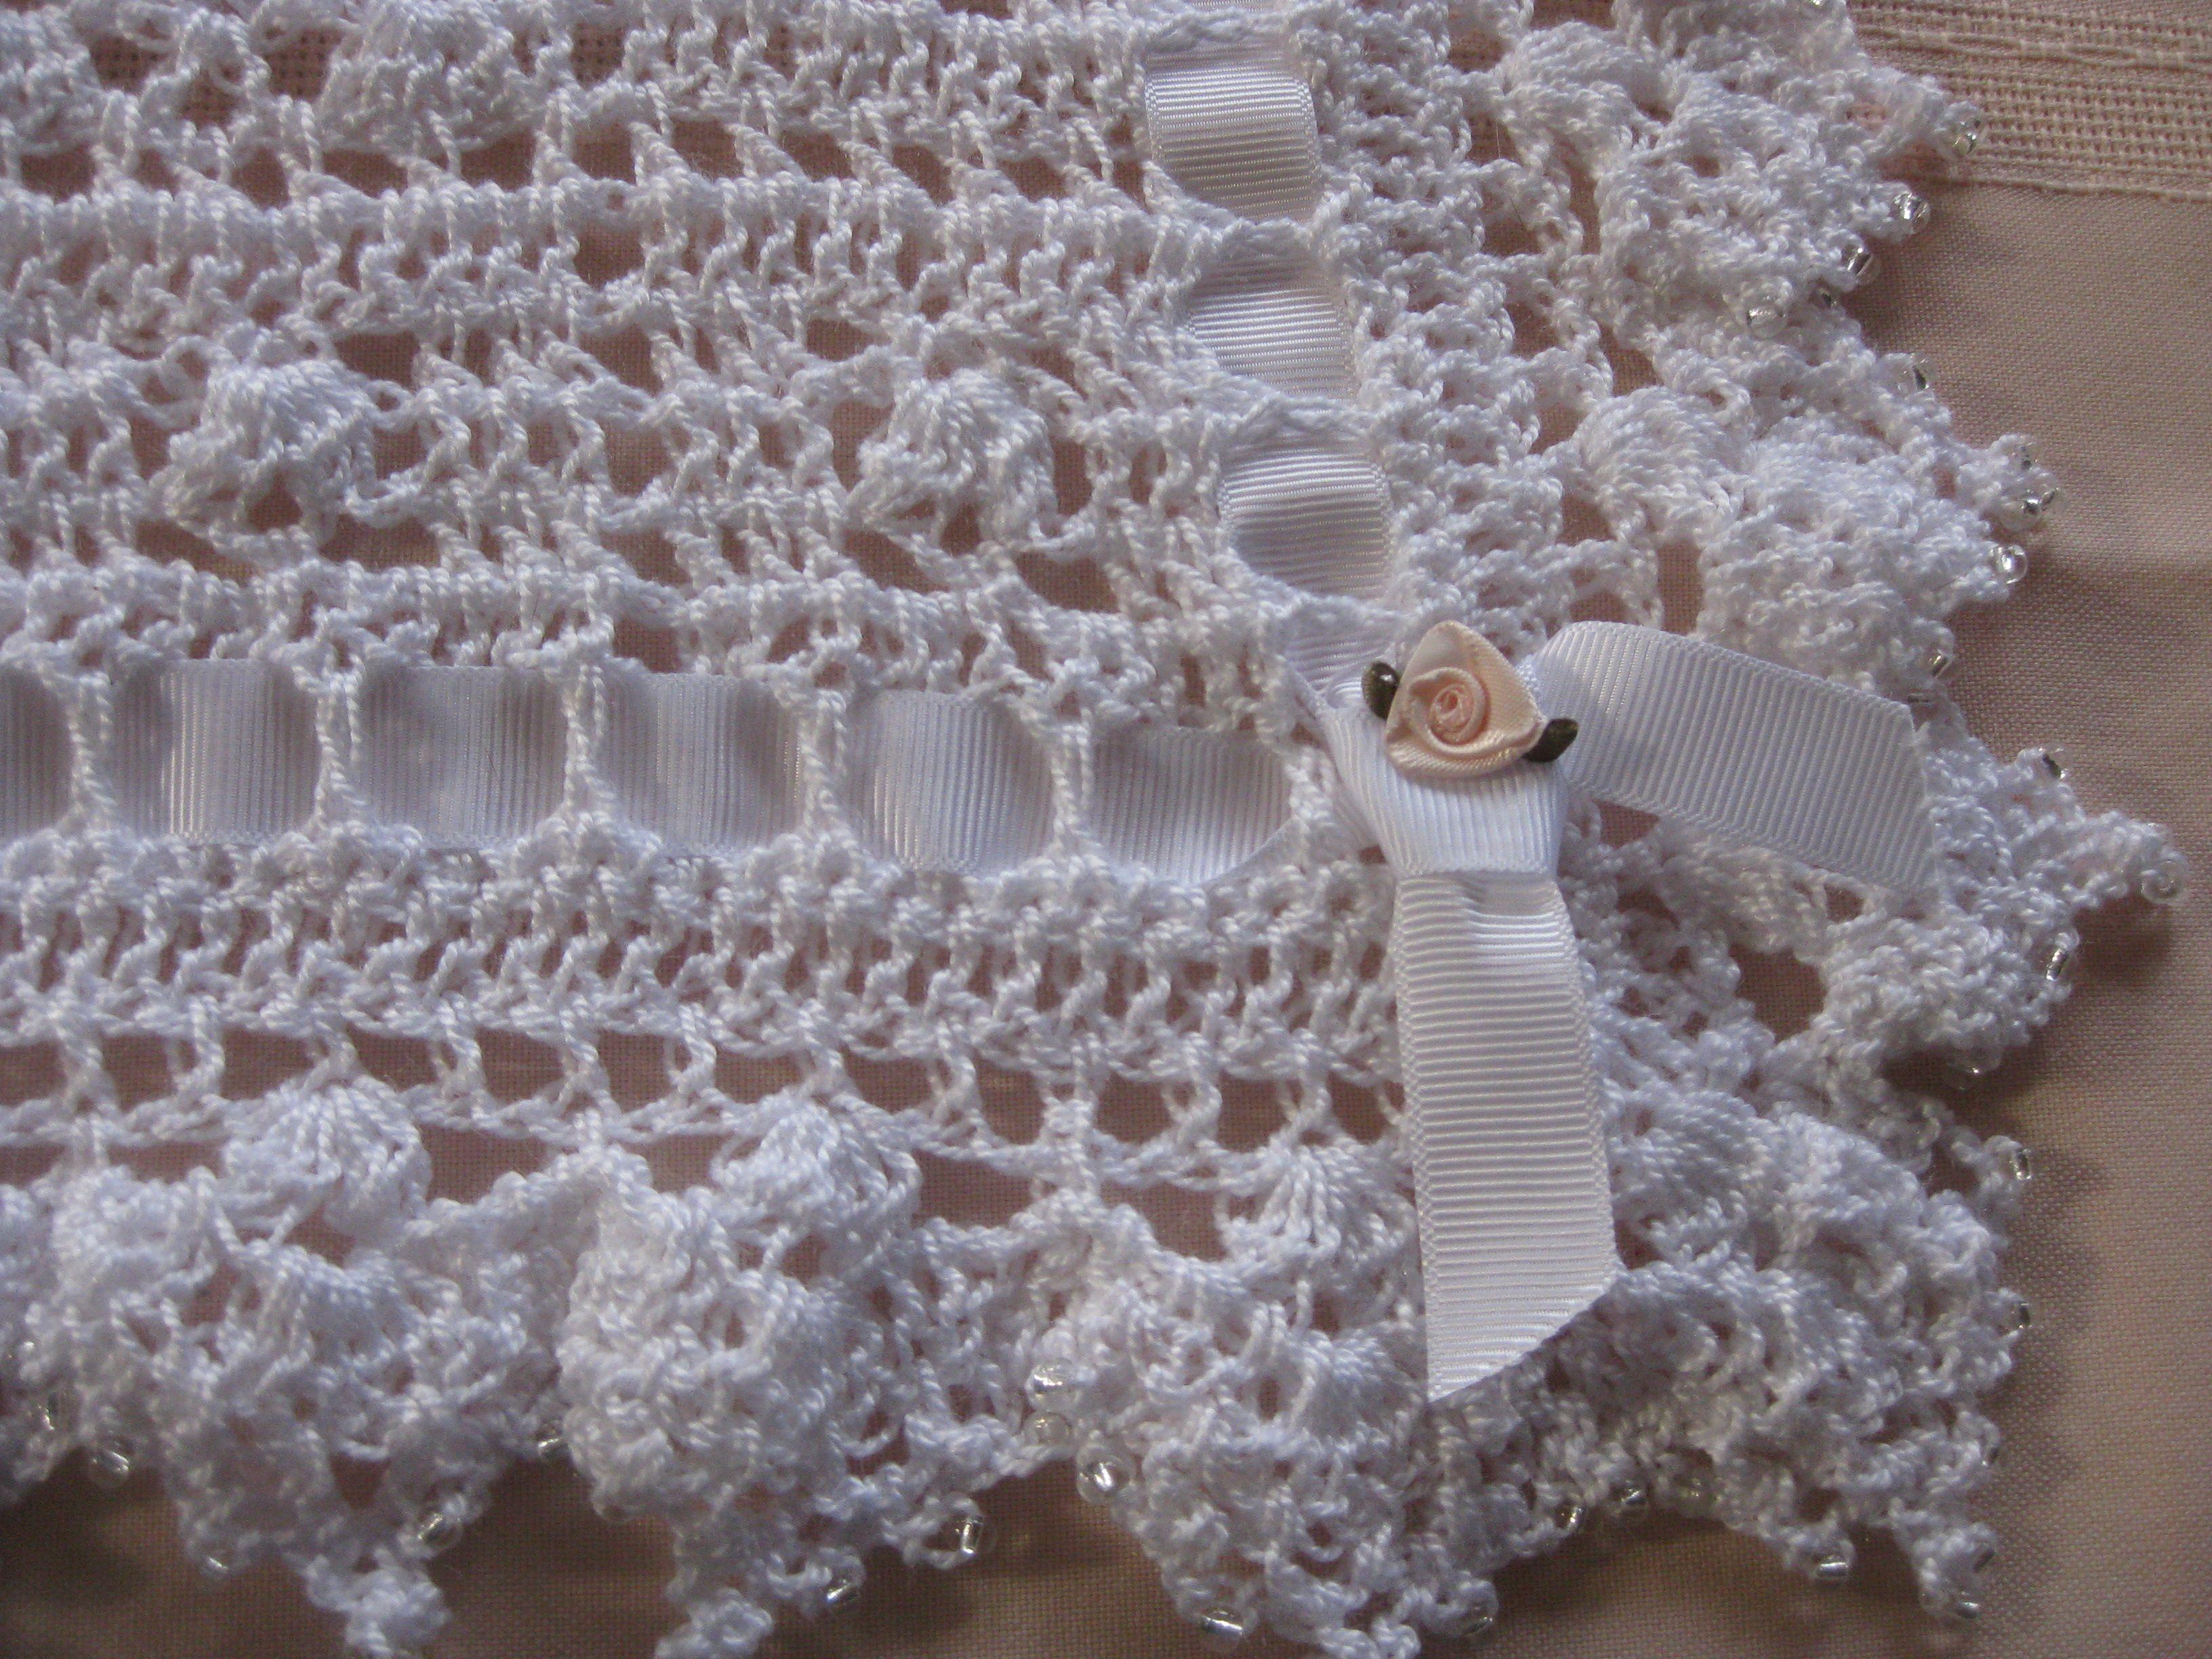 Crochet Patterns Christening Blanket : Christening Blanket crochet patterns Pinterest